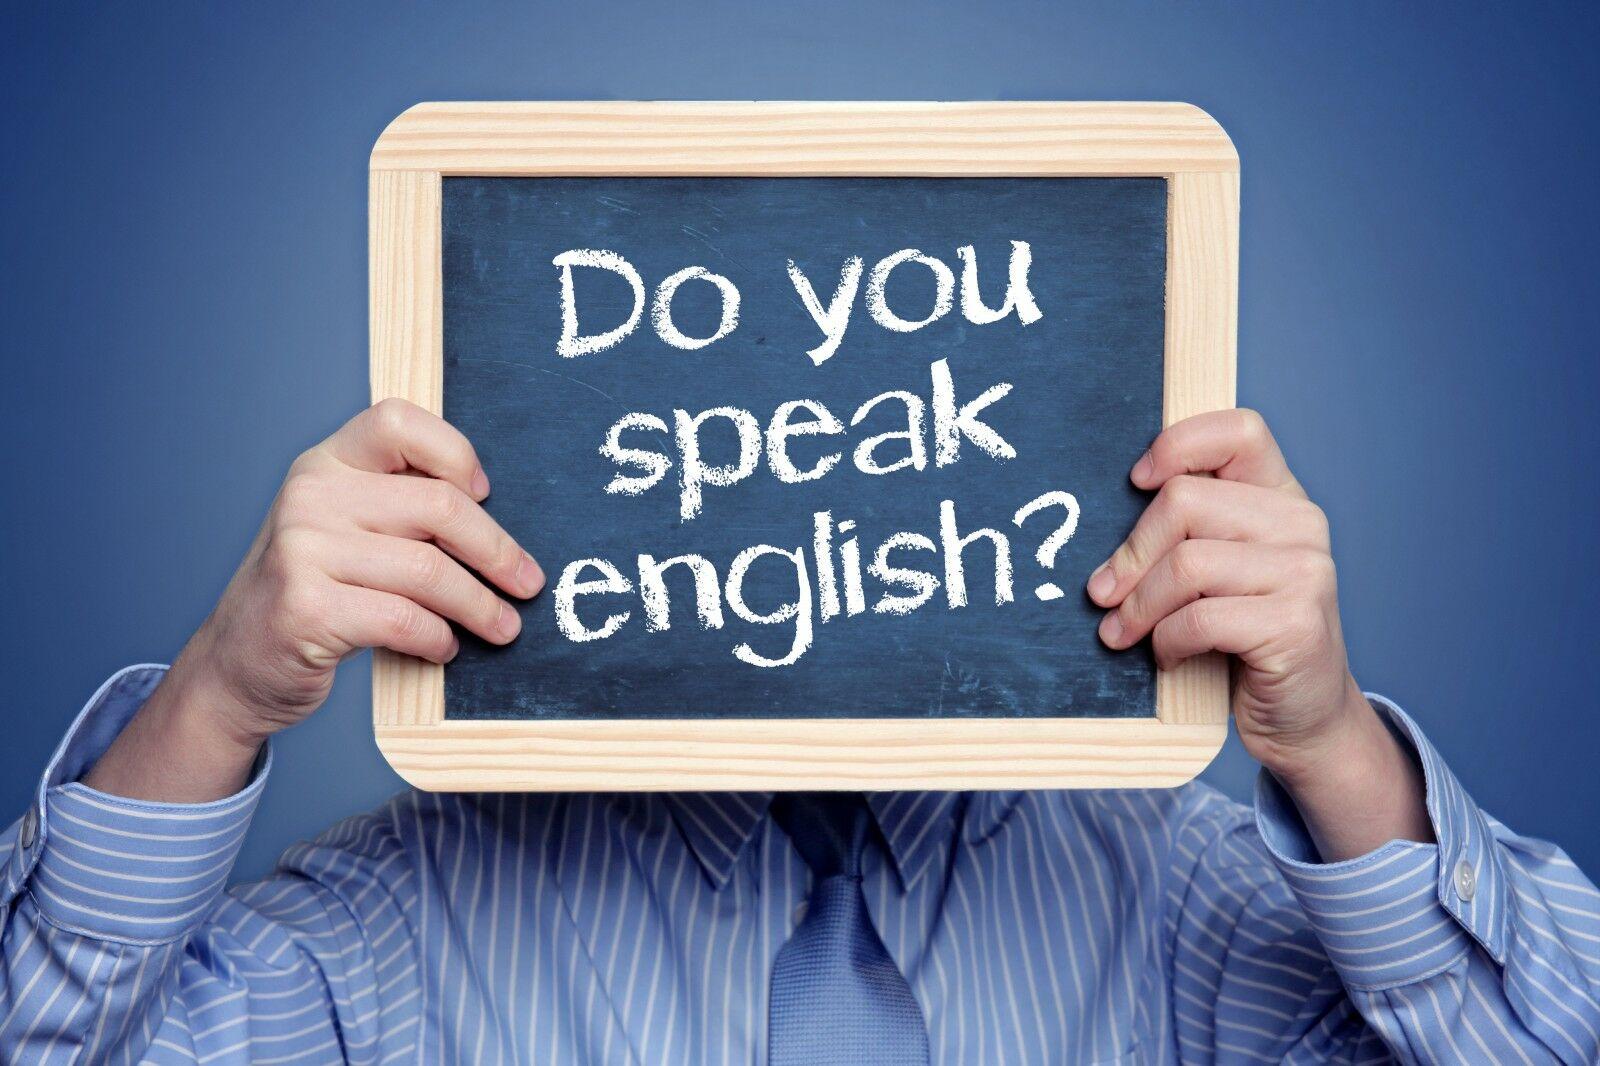 Waduh! Kemampuan Bahasa Inggris Orang Indonesia Kalah dari Negara Tetangga?